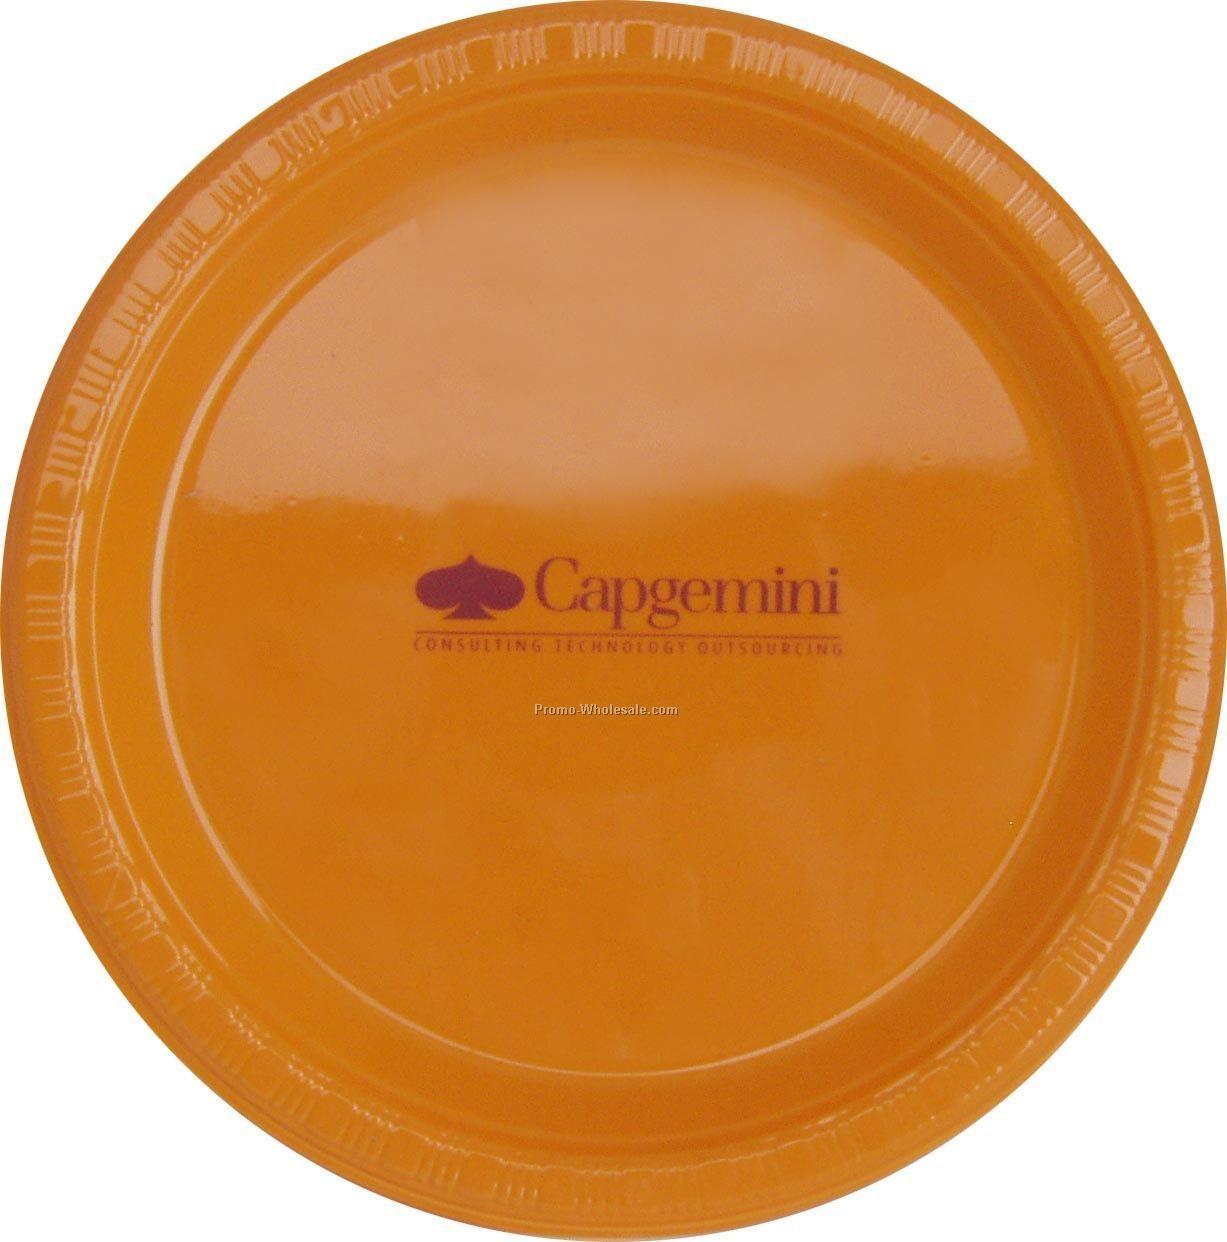 "Colorware 9"" Sunkissed Orange Plate"